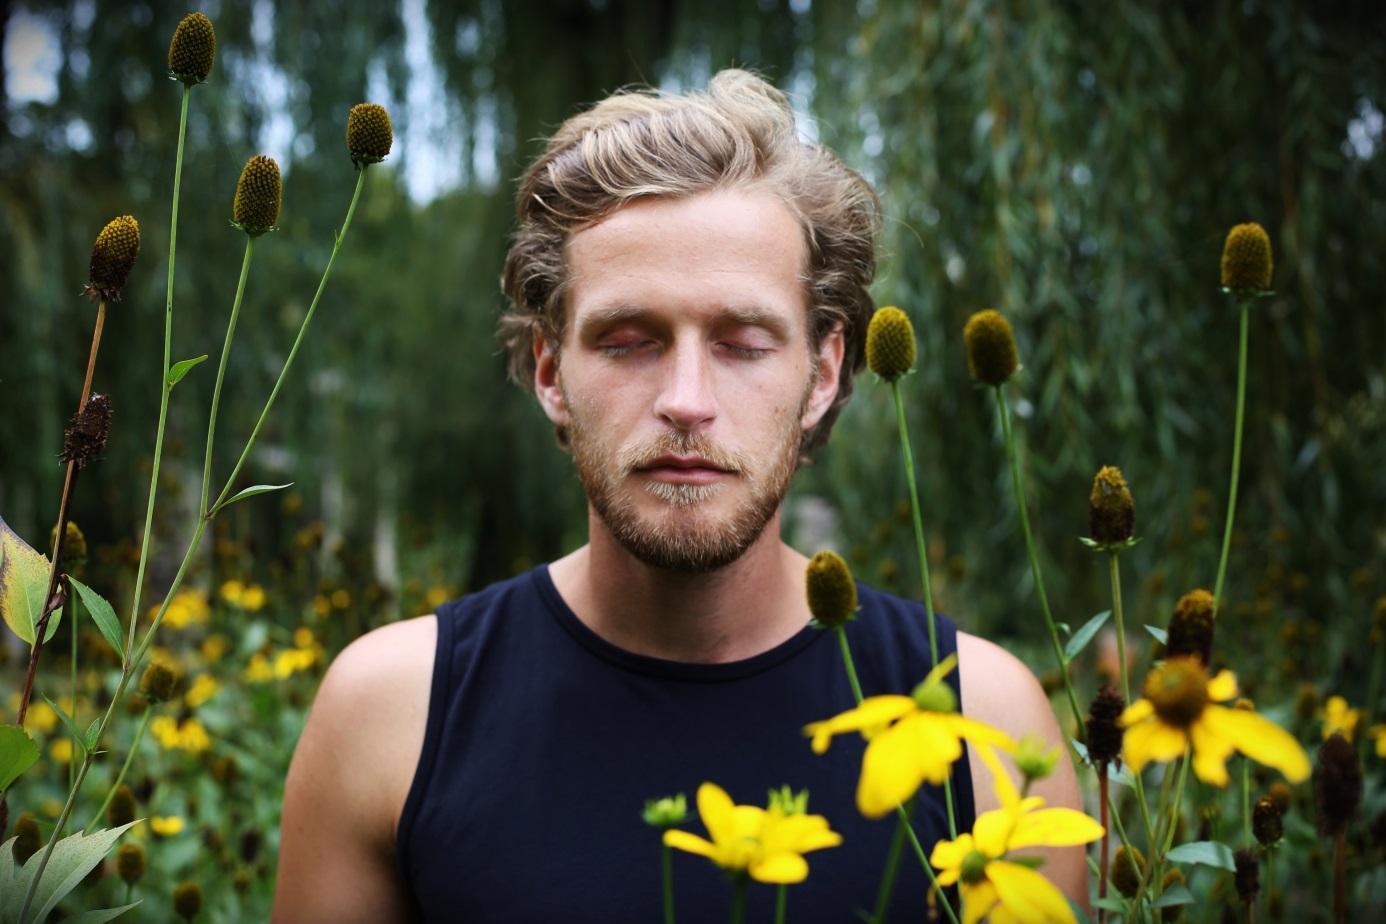 Dirk Wilhelm